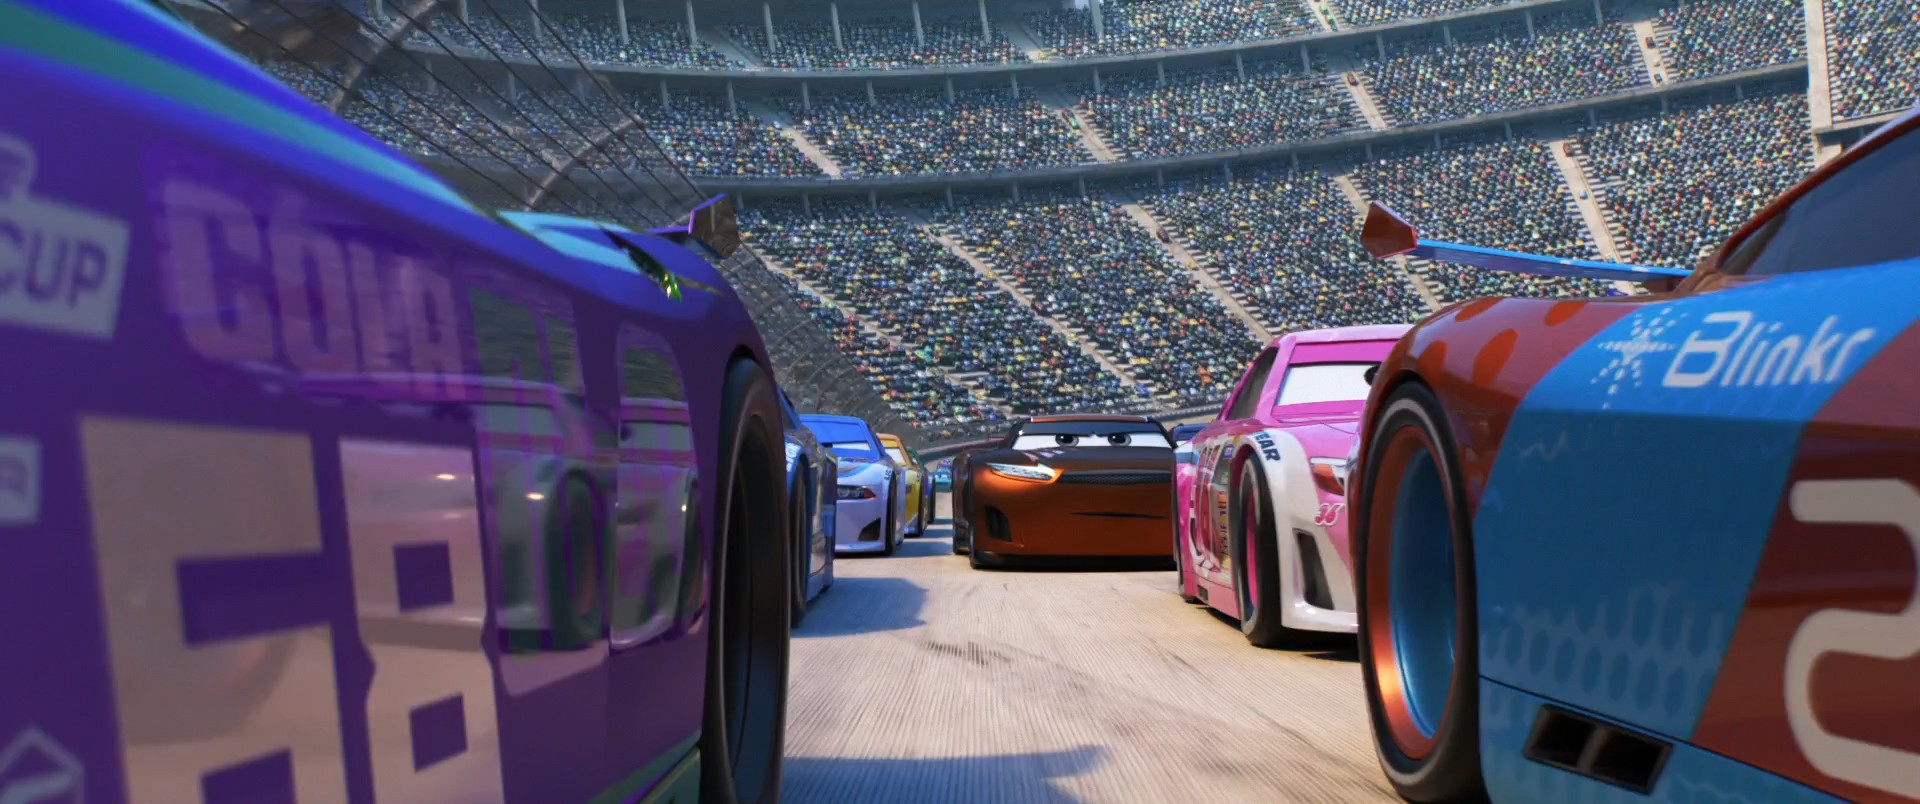 Тачки 3 / Cars 3 (2017) WEB-DL 1080p